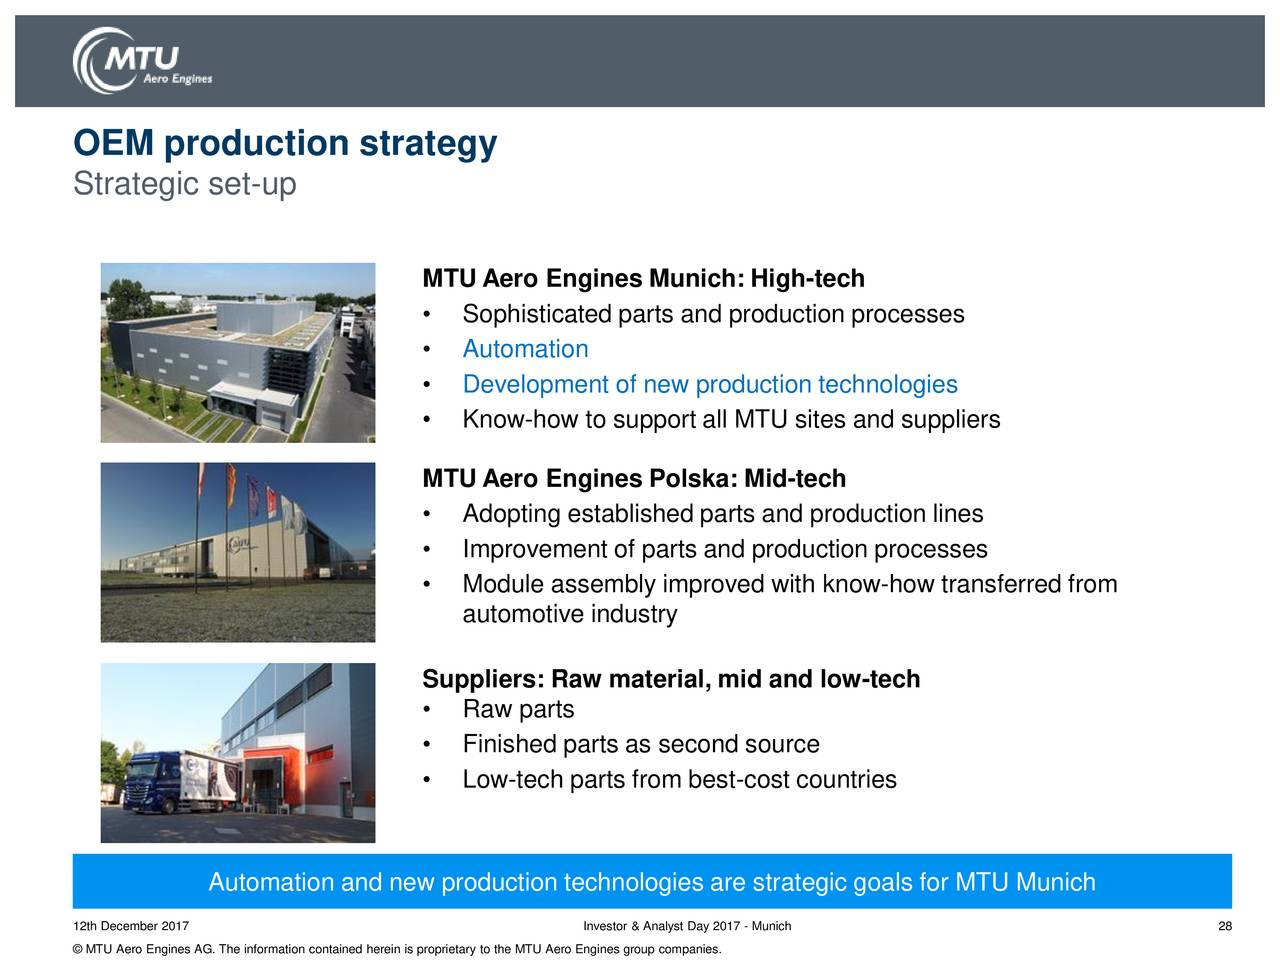 MTU Aero Engines (MTUAY) Investor Presentation - Slideshow